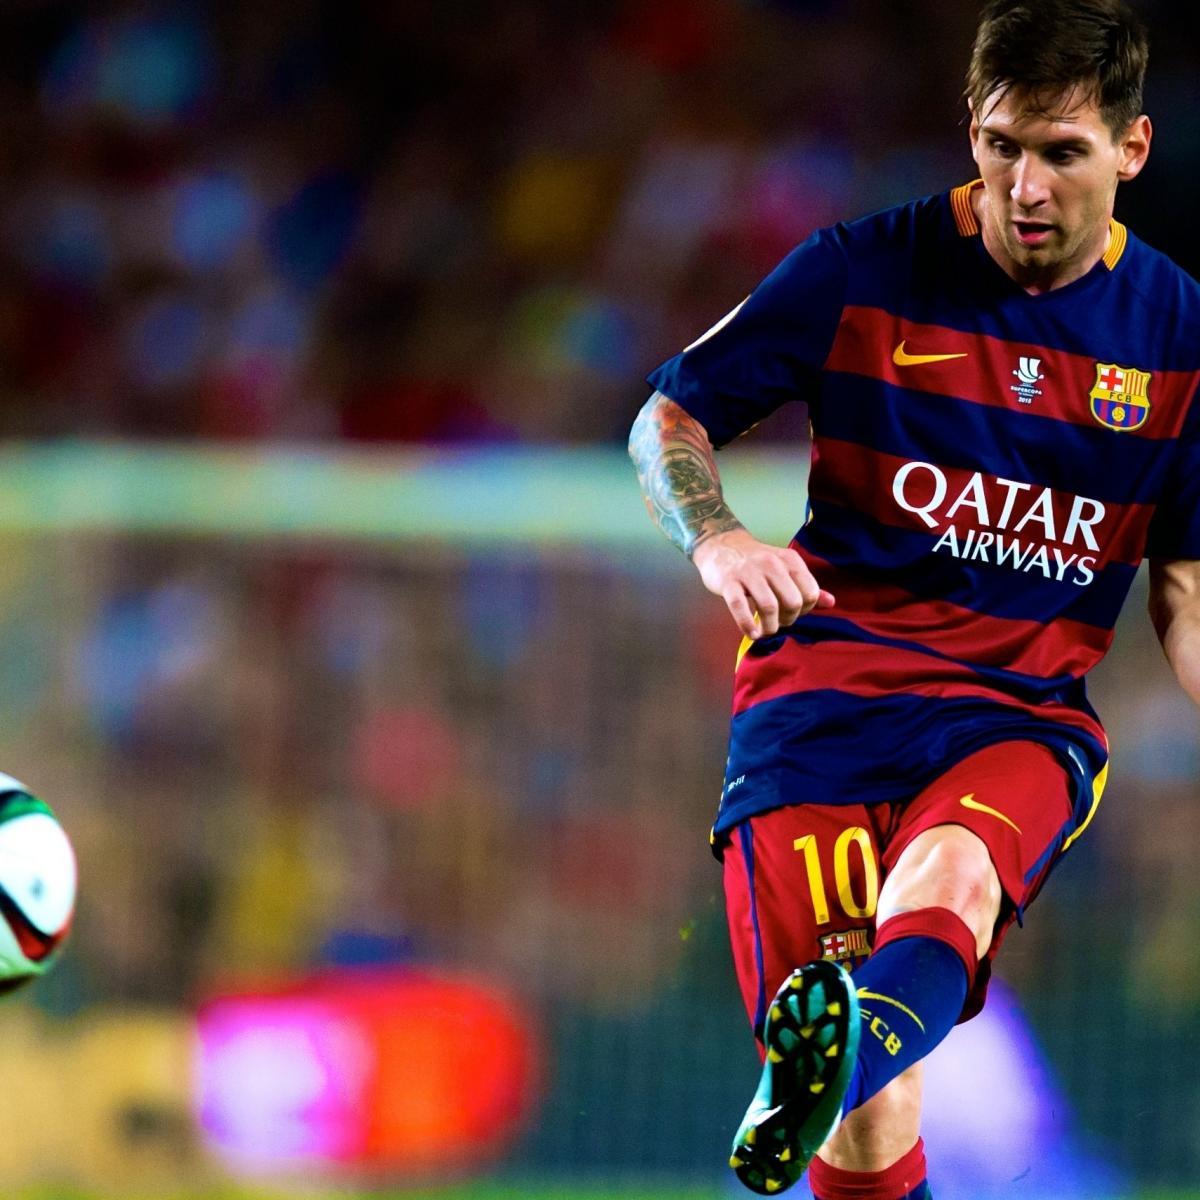 Arsenal Vs Barcelona Live Score Highlights From: Athletic Bilbao Vs. Barcelona: Live Score, Highlights From